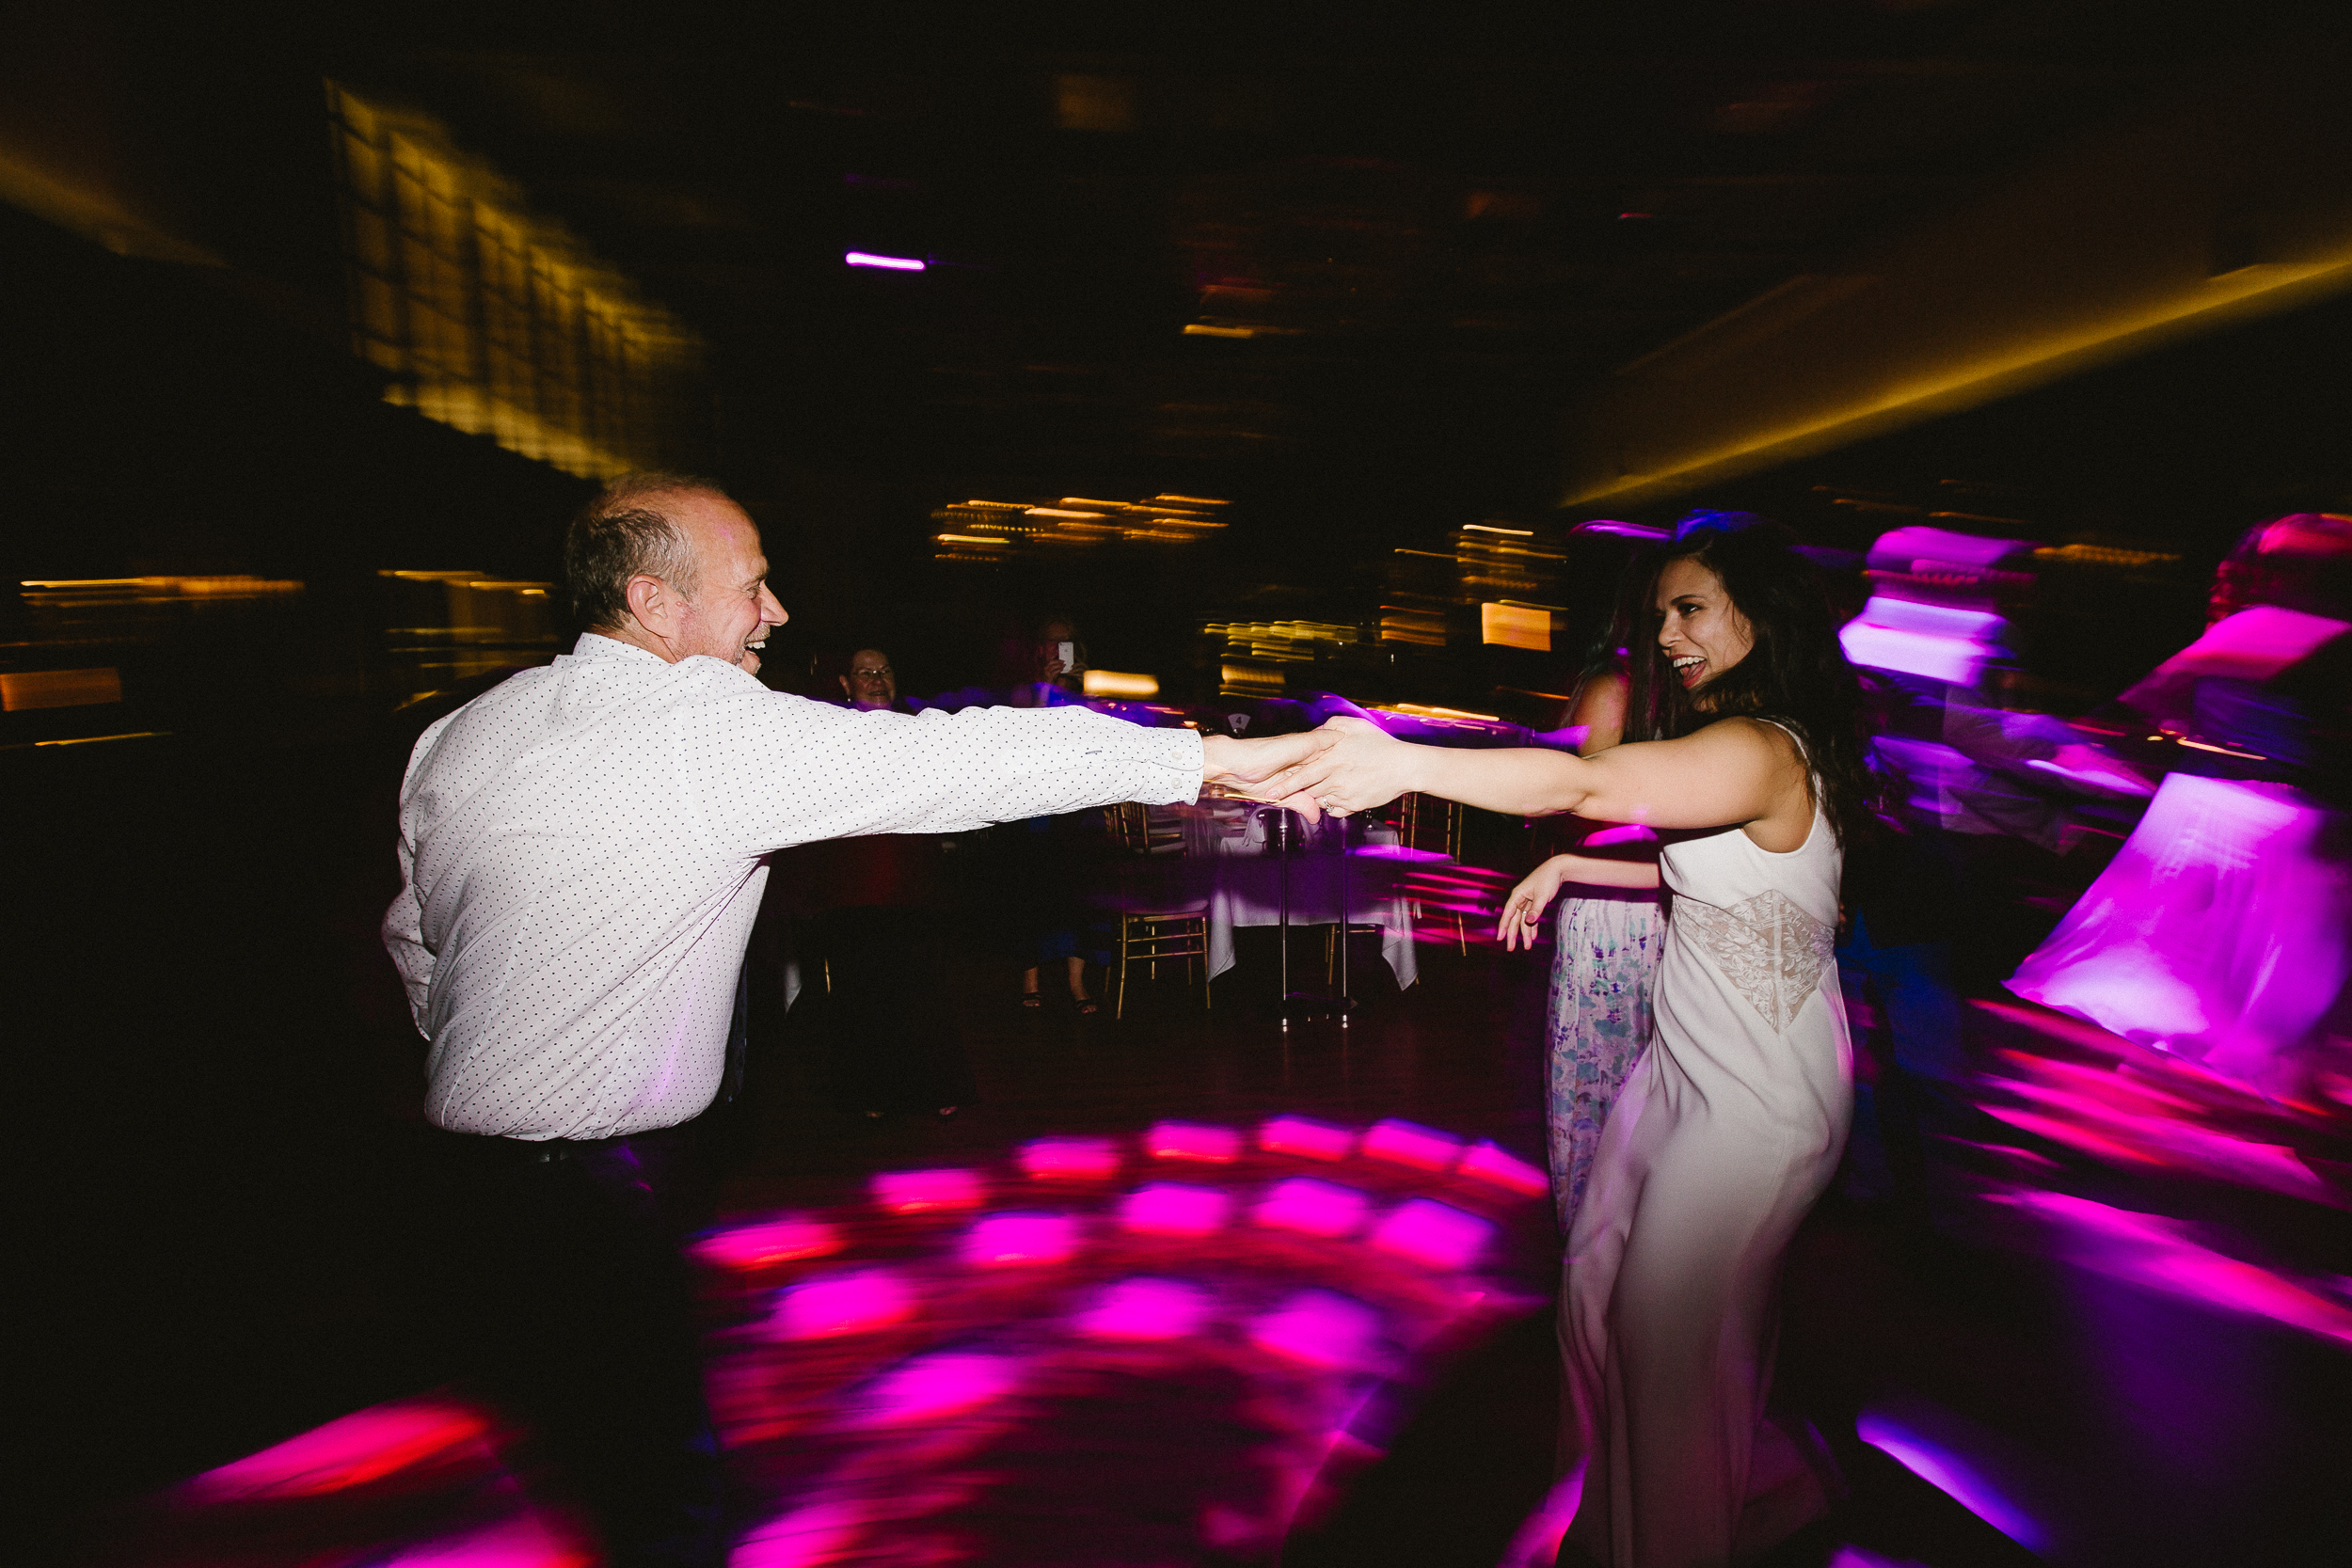 Singapore+Actual+Day+Wedding+Photographer+Raffles+Town+Club+Joseph+Ailee-0089.jpg